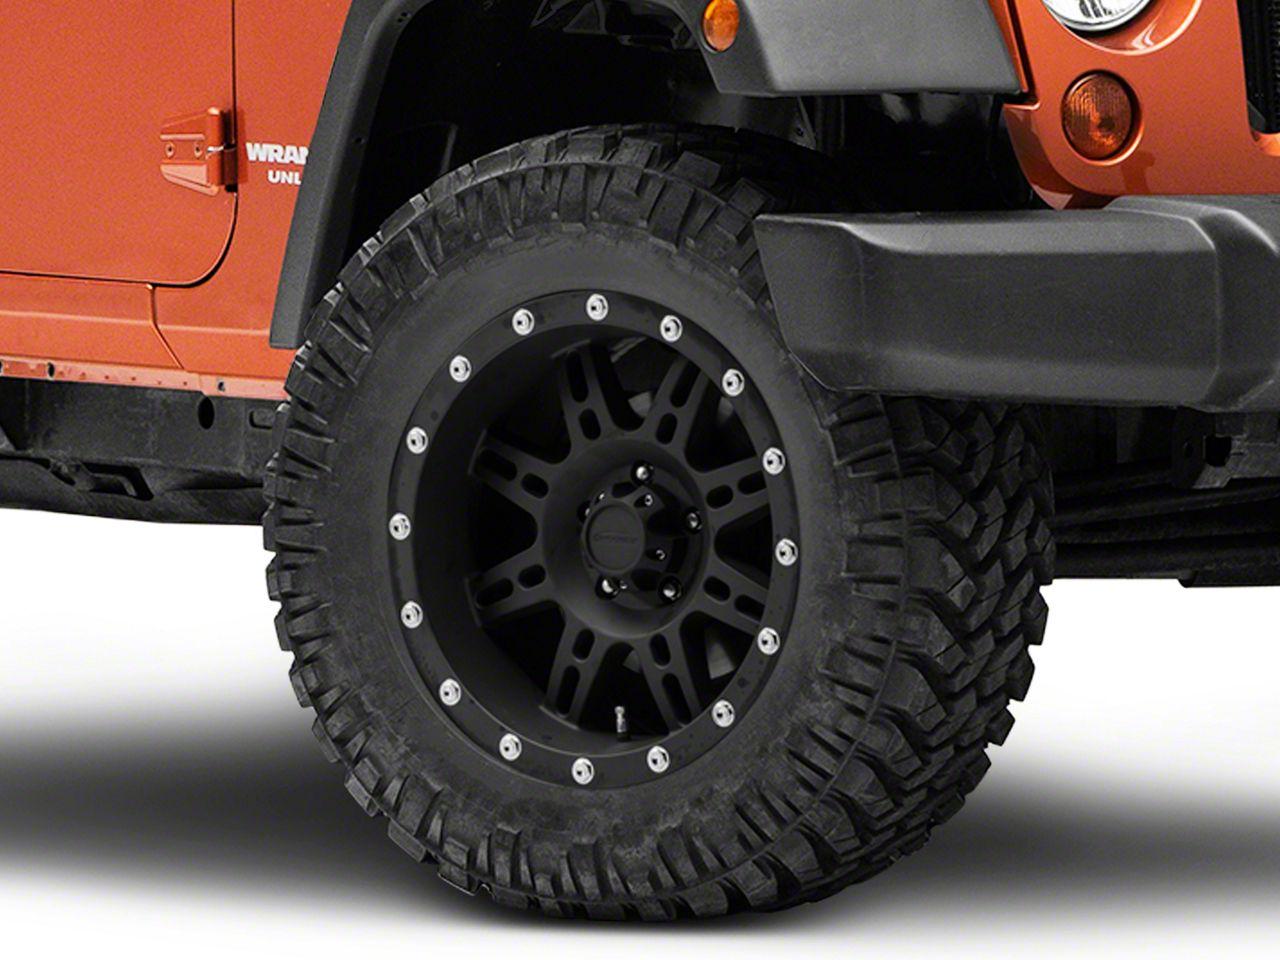 Pro Comp Alloy Series 7031 Flat Black Wheel - 18x9 (07-18 Jeep Wrangler JK)